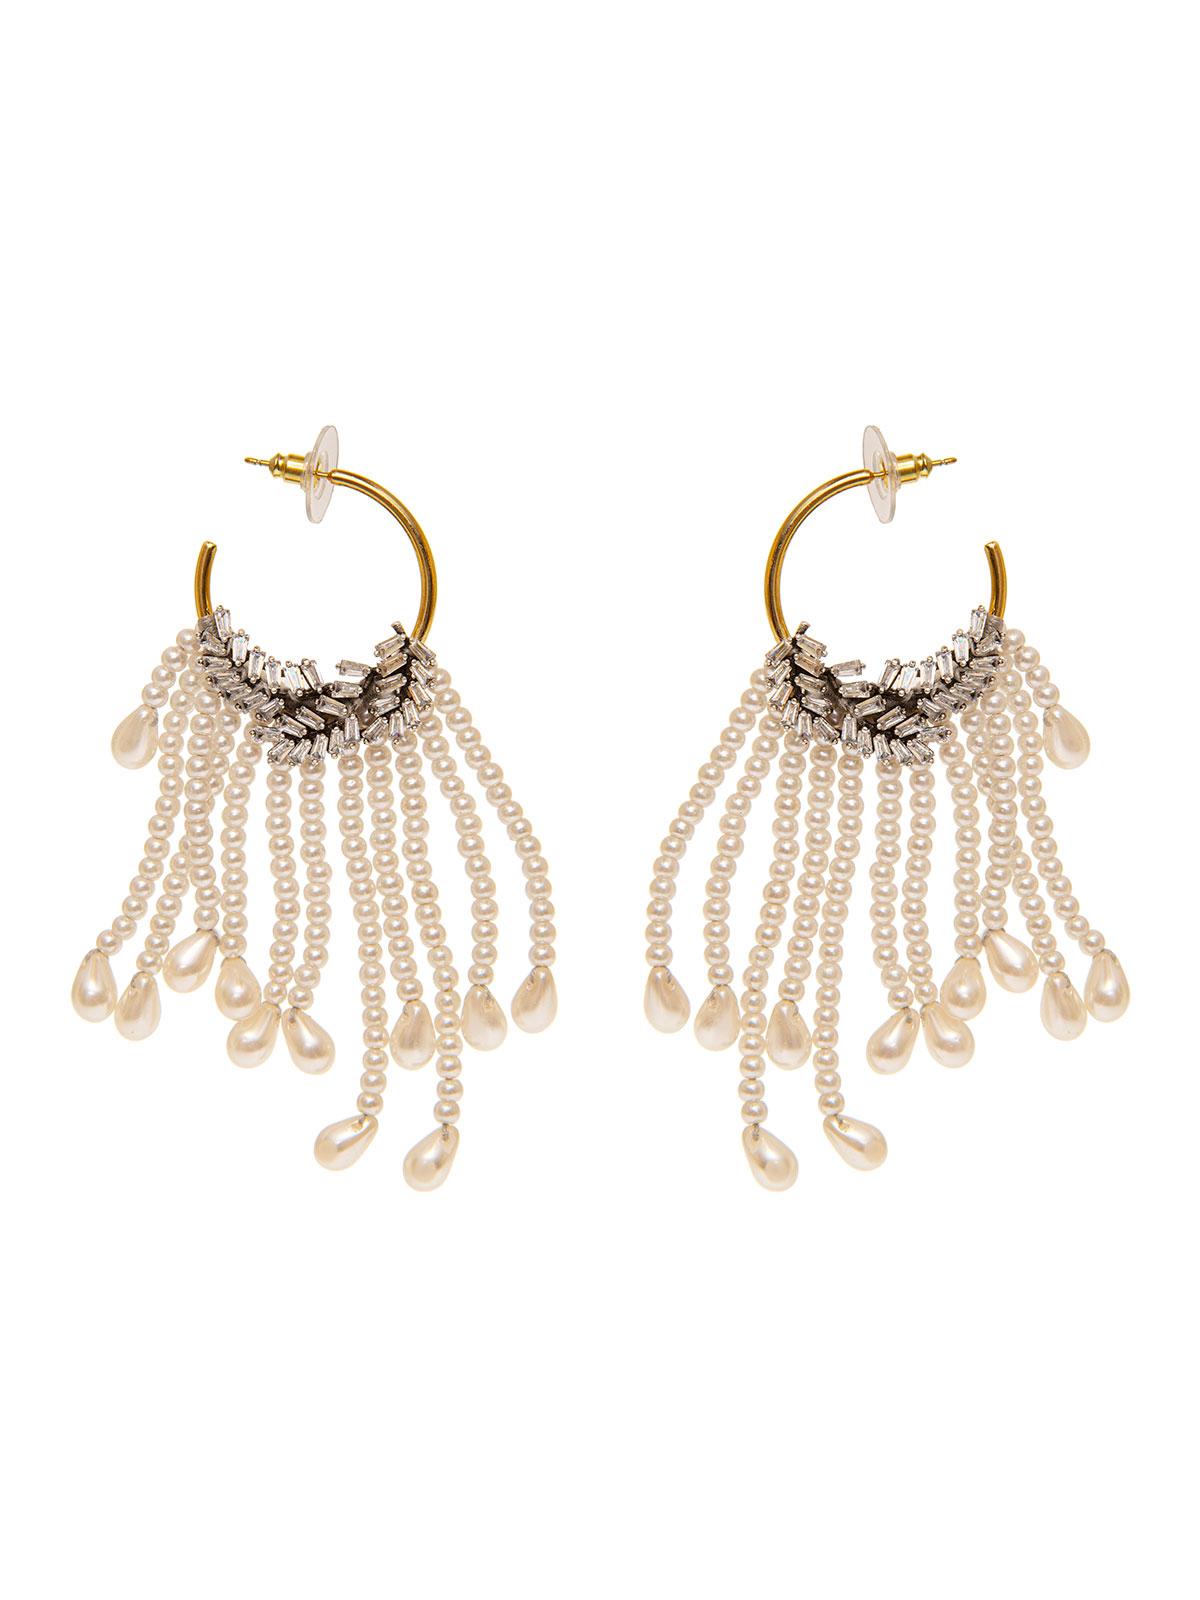 Hoop earrings with crystal leaves and pendent pearls